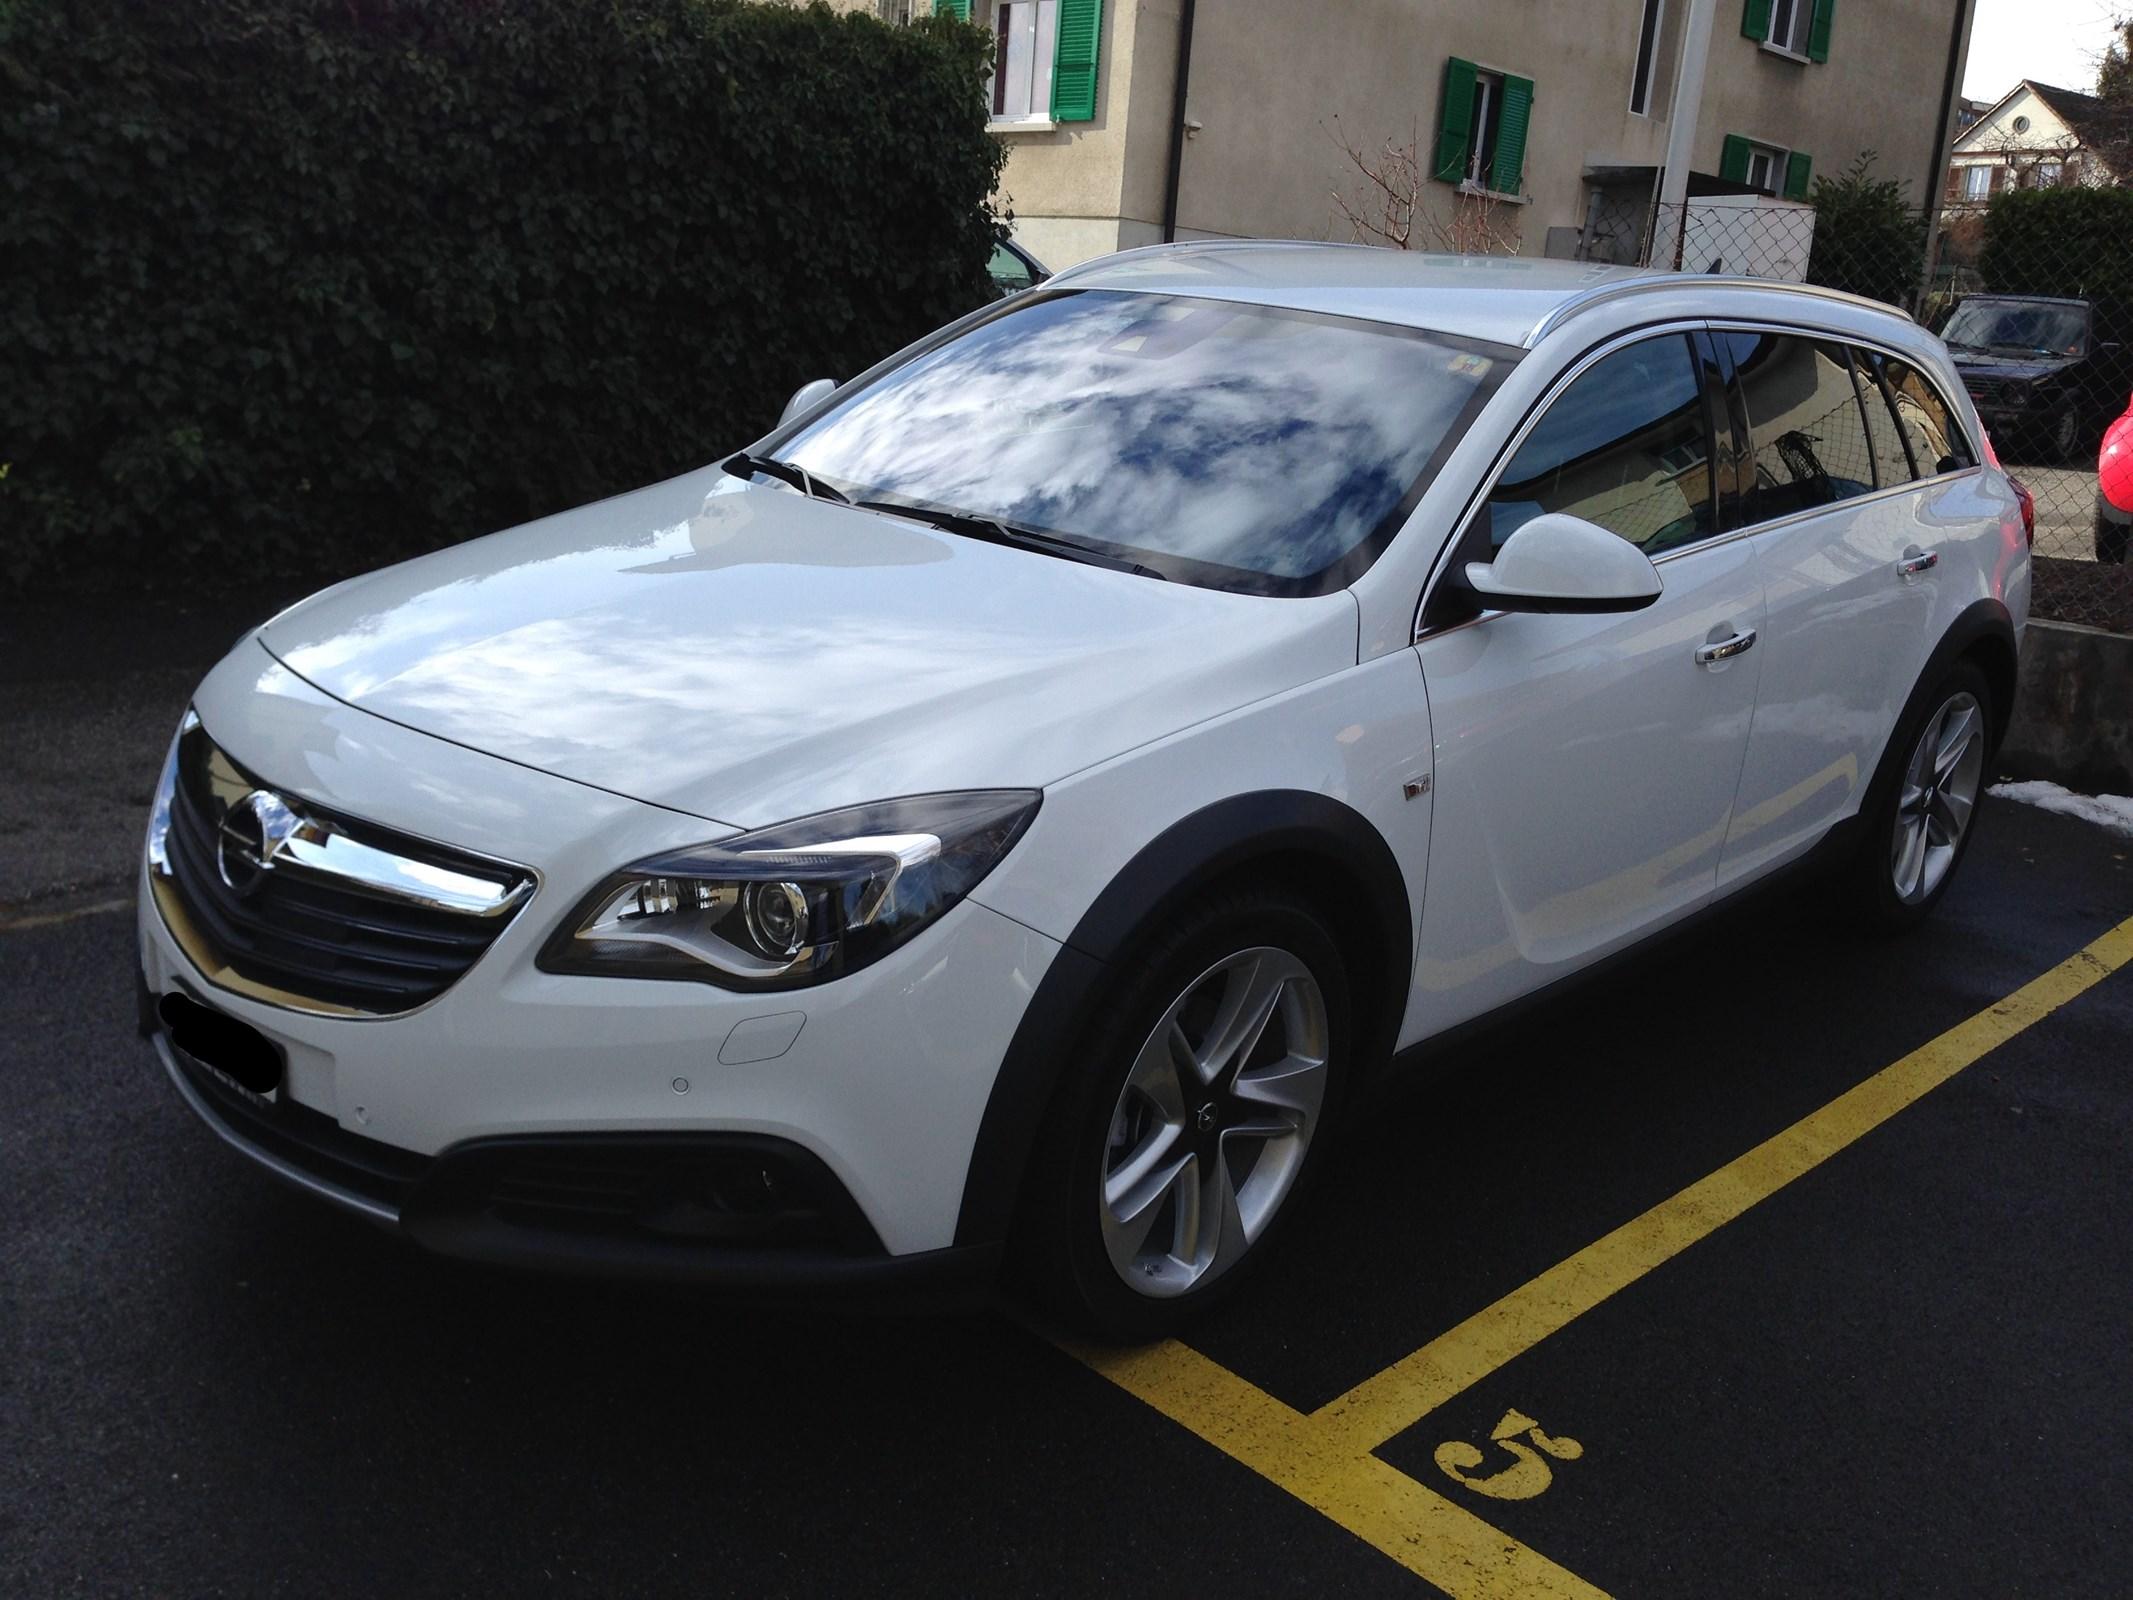 Opel Insignia Country Tourer 2.0 CDTi 195 4x4